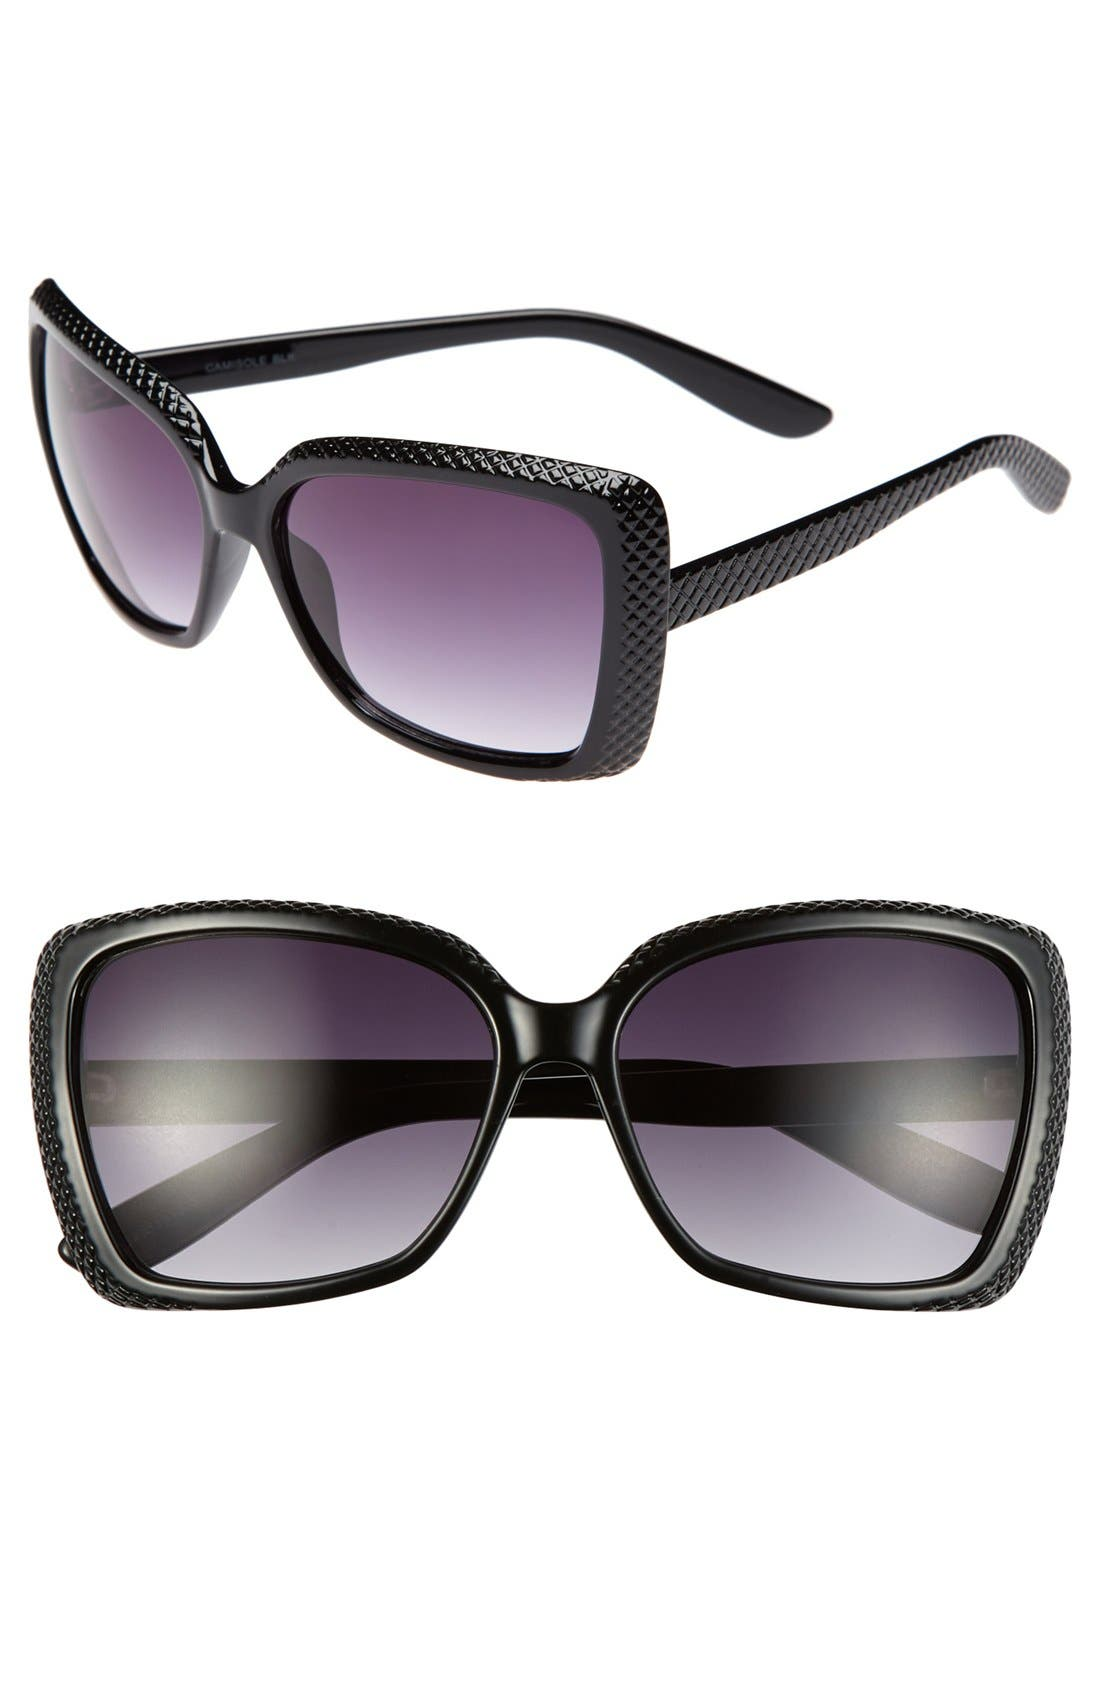 Alternate Image 1 Selected - Outlook Eyewear 58mm Retro Sunglasses